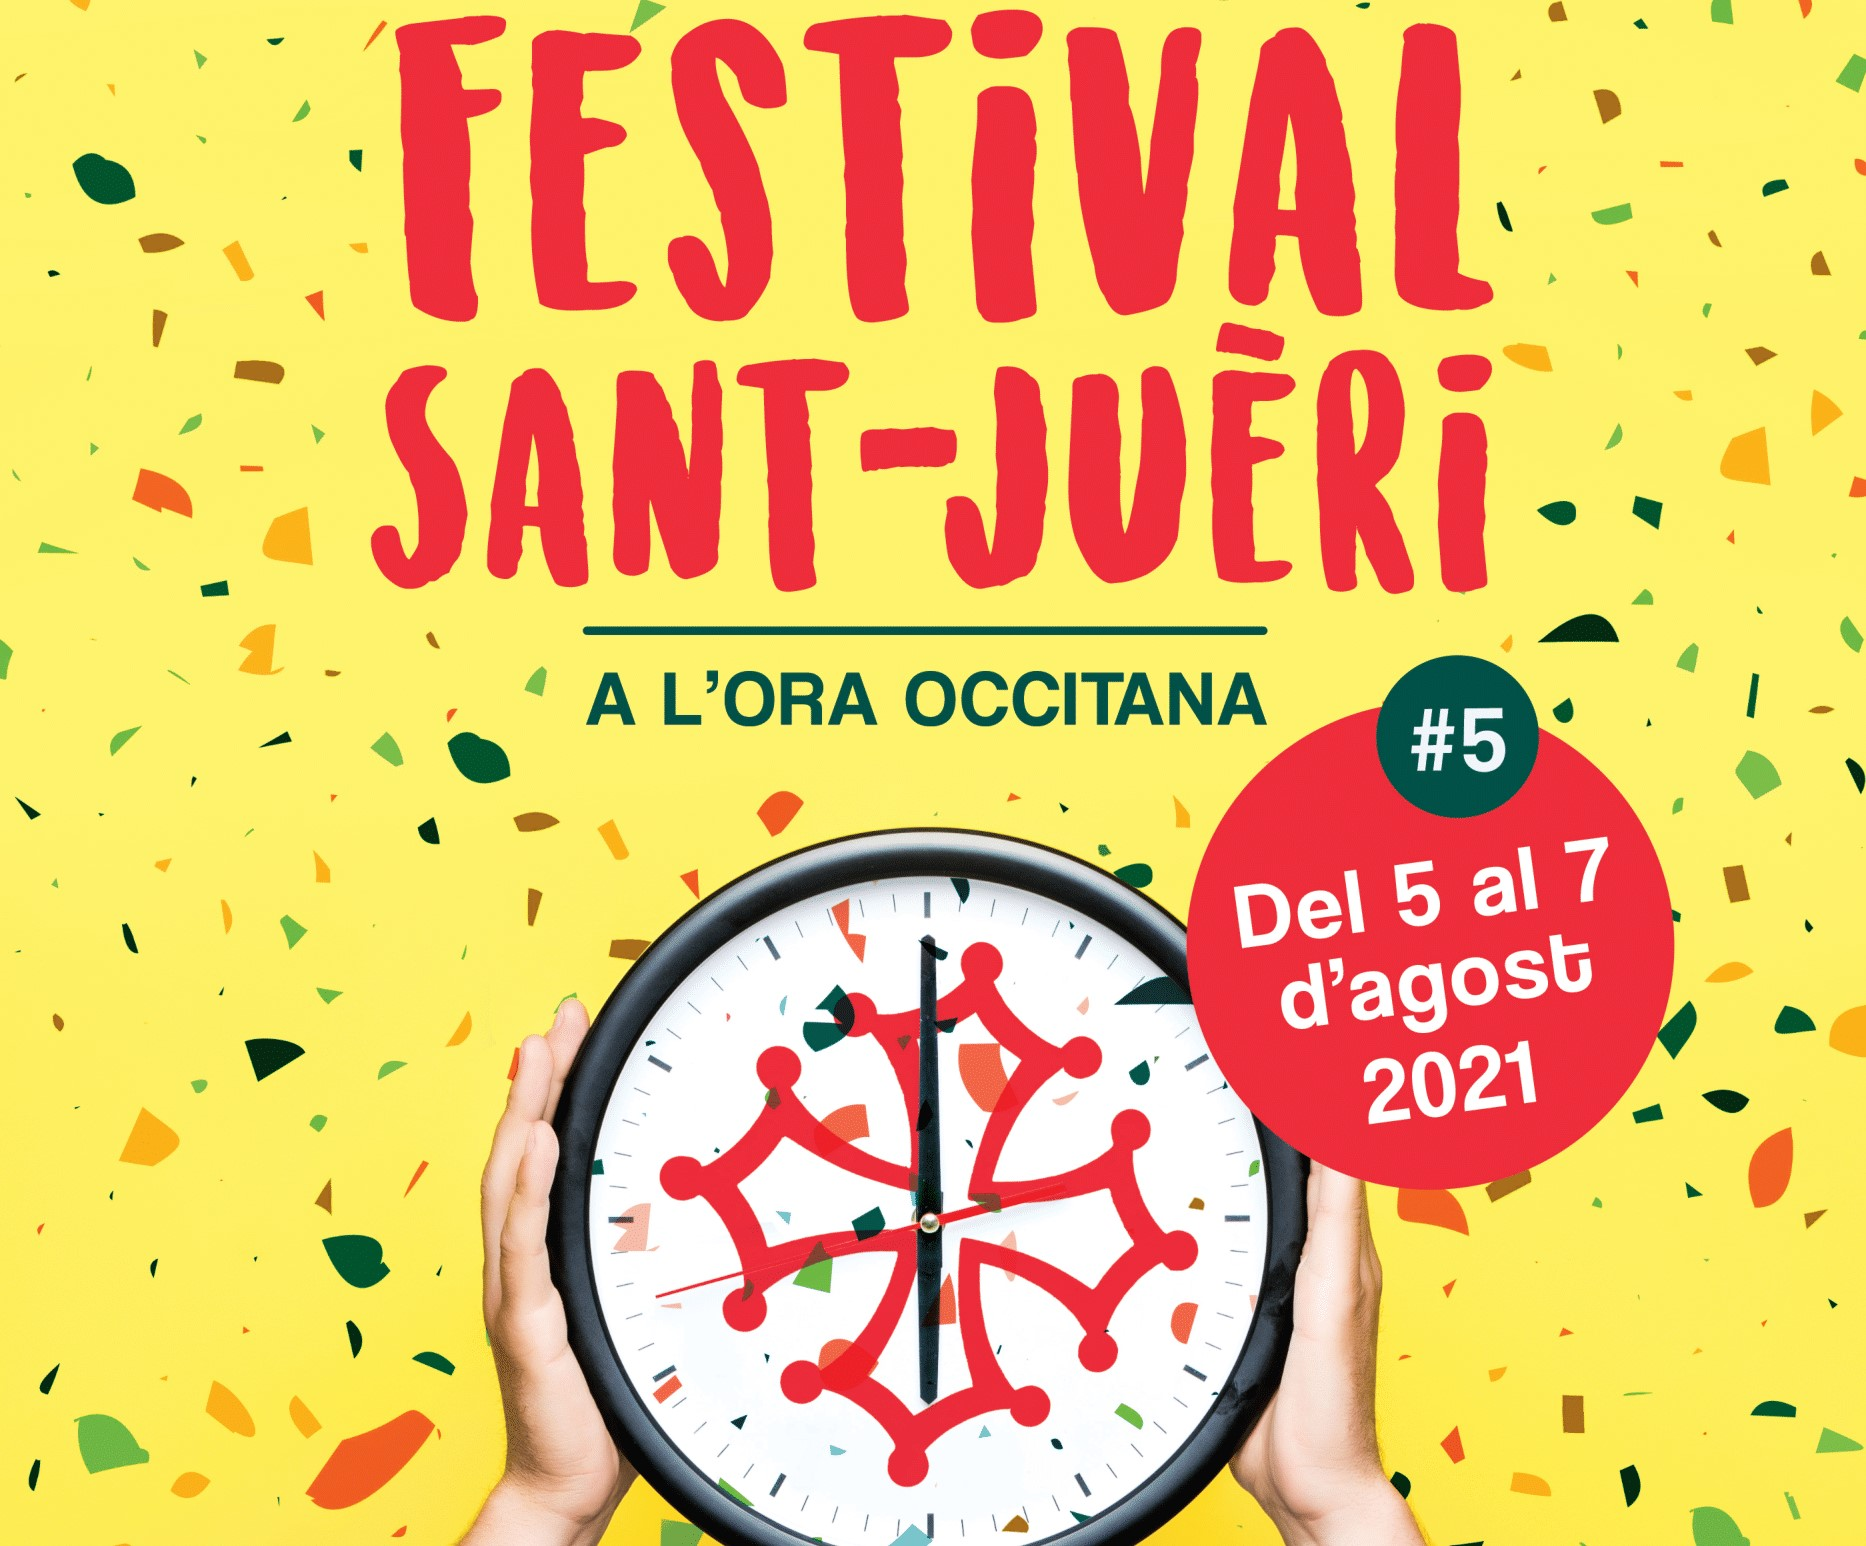 You are currently viewing Sant Juèri a l'ora occitana 2021!